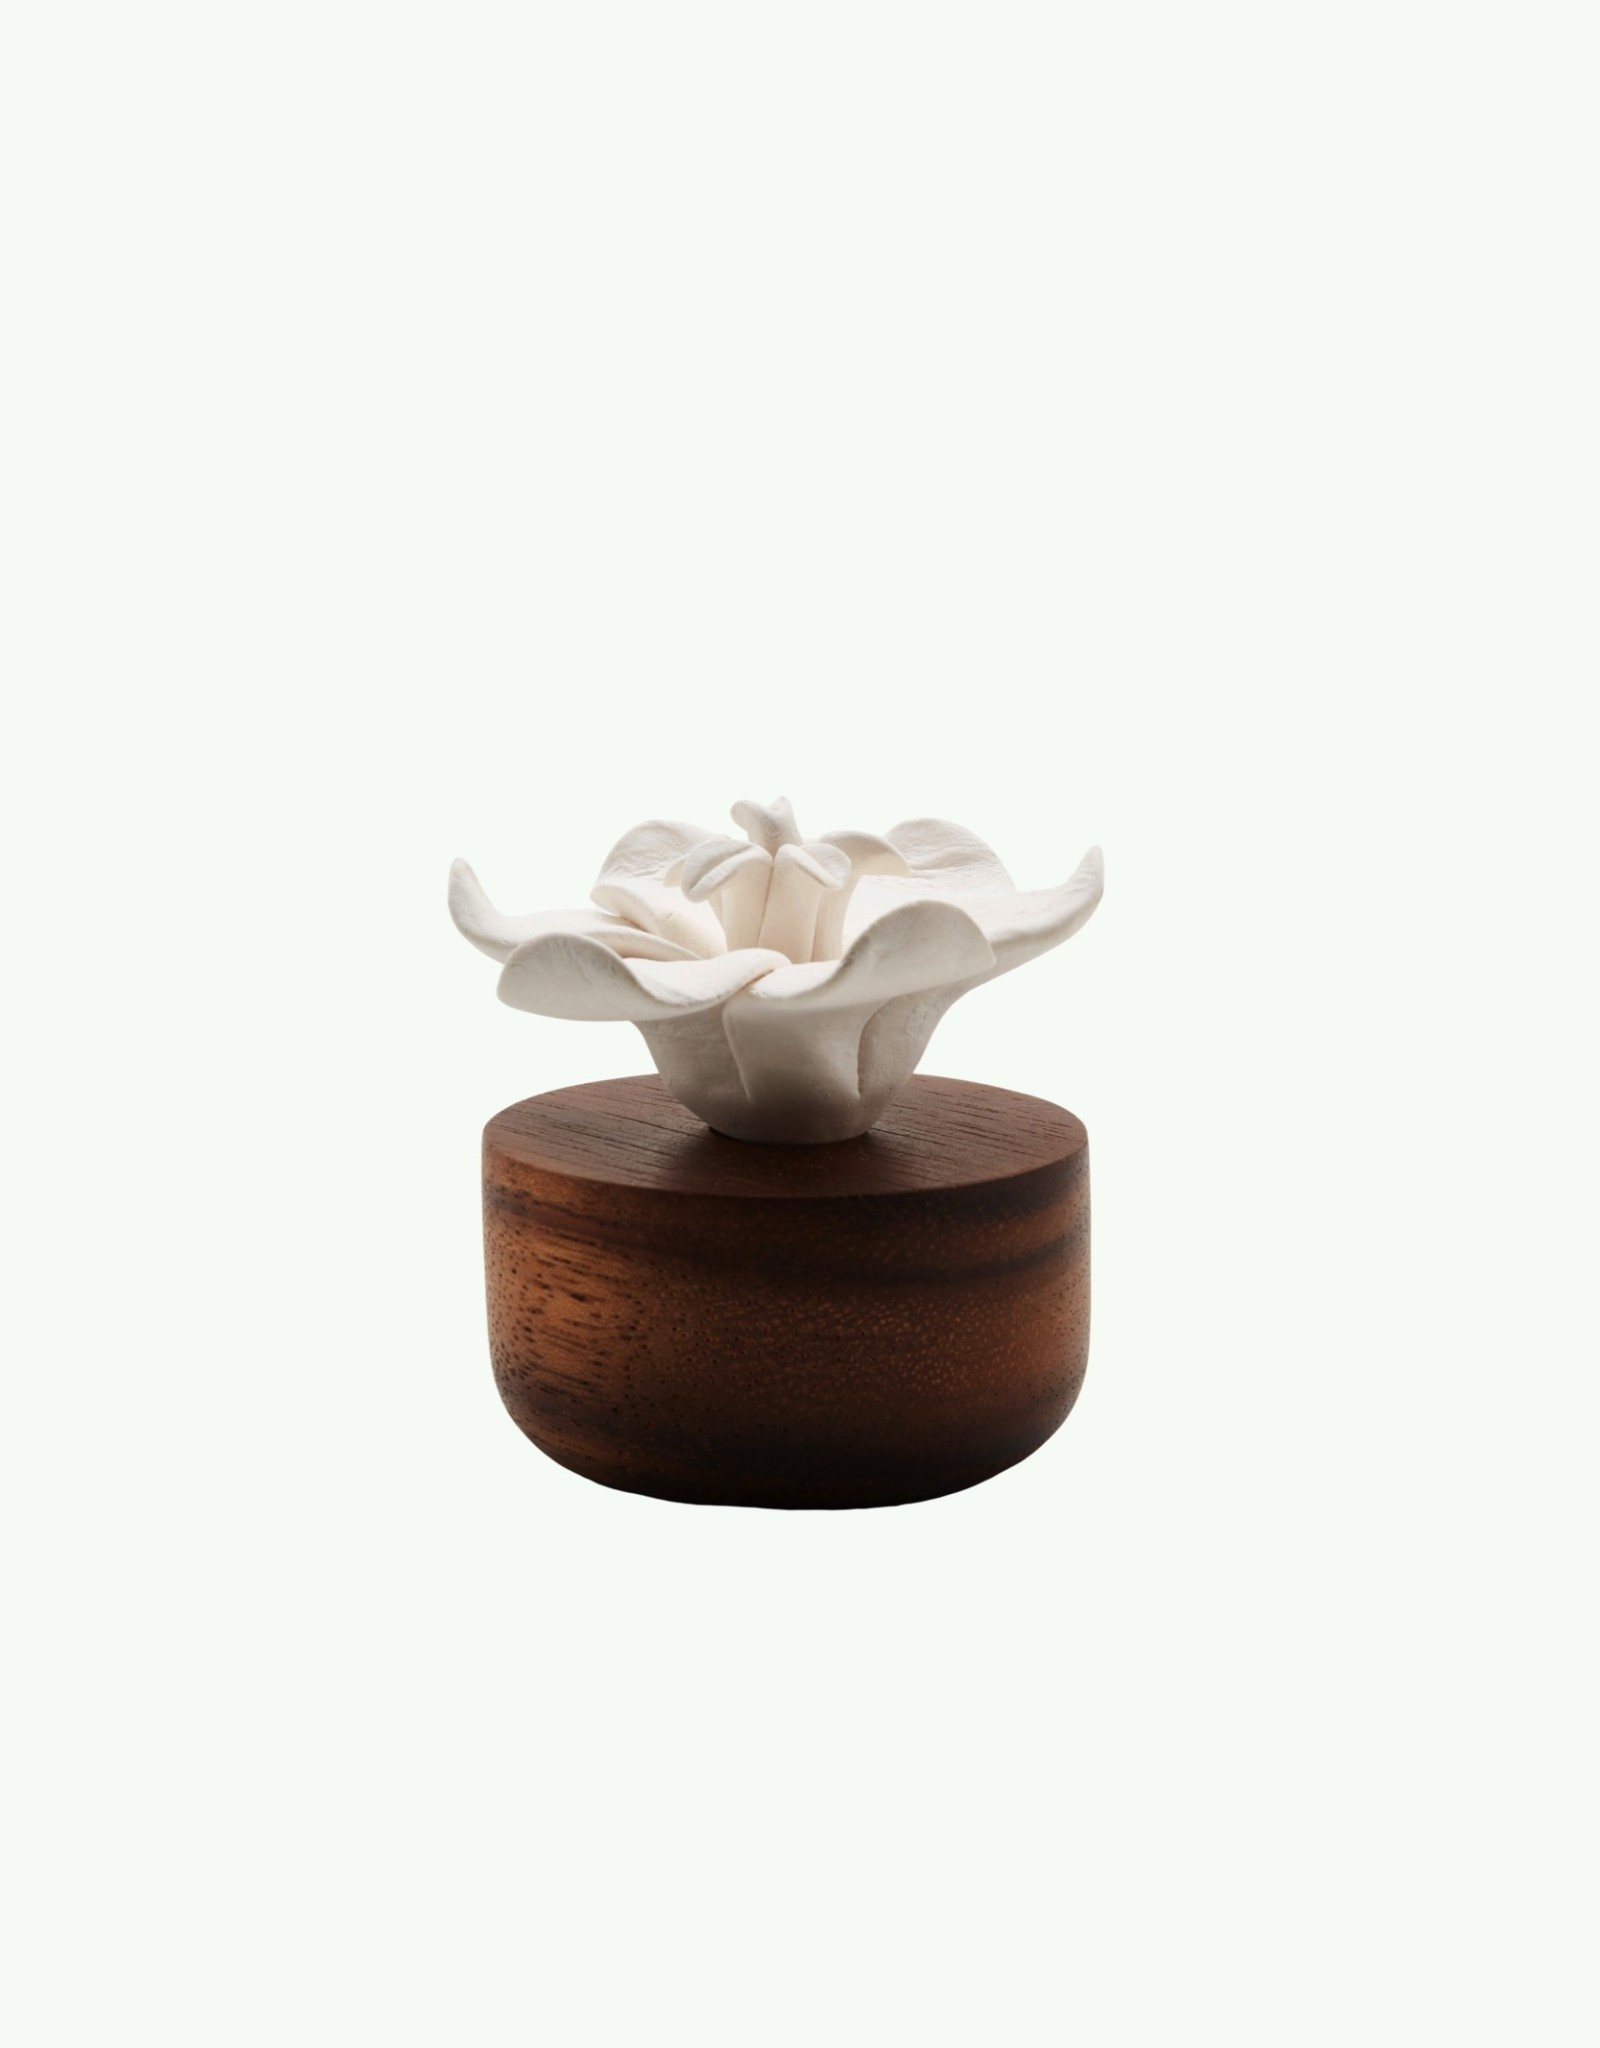 Anoq Anoq - Jasmin d'Orient - Perfume Diffuser - 2 colours